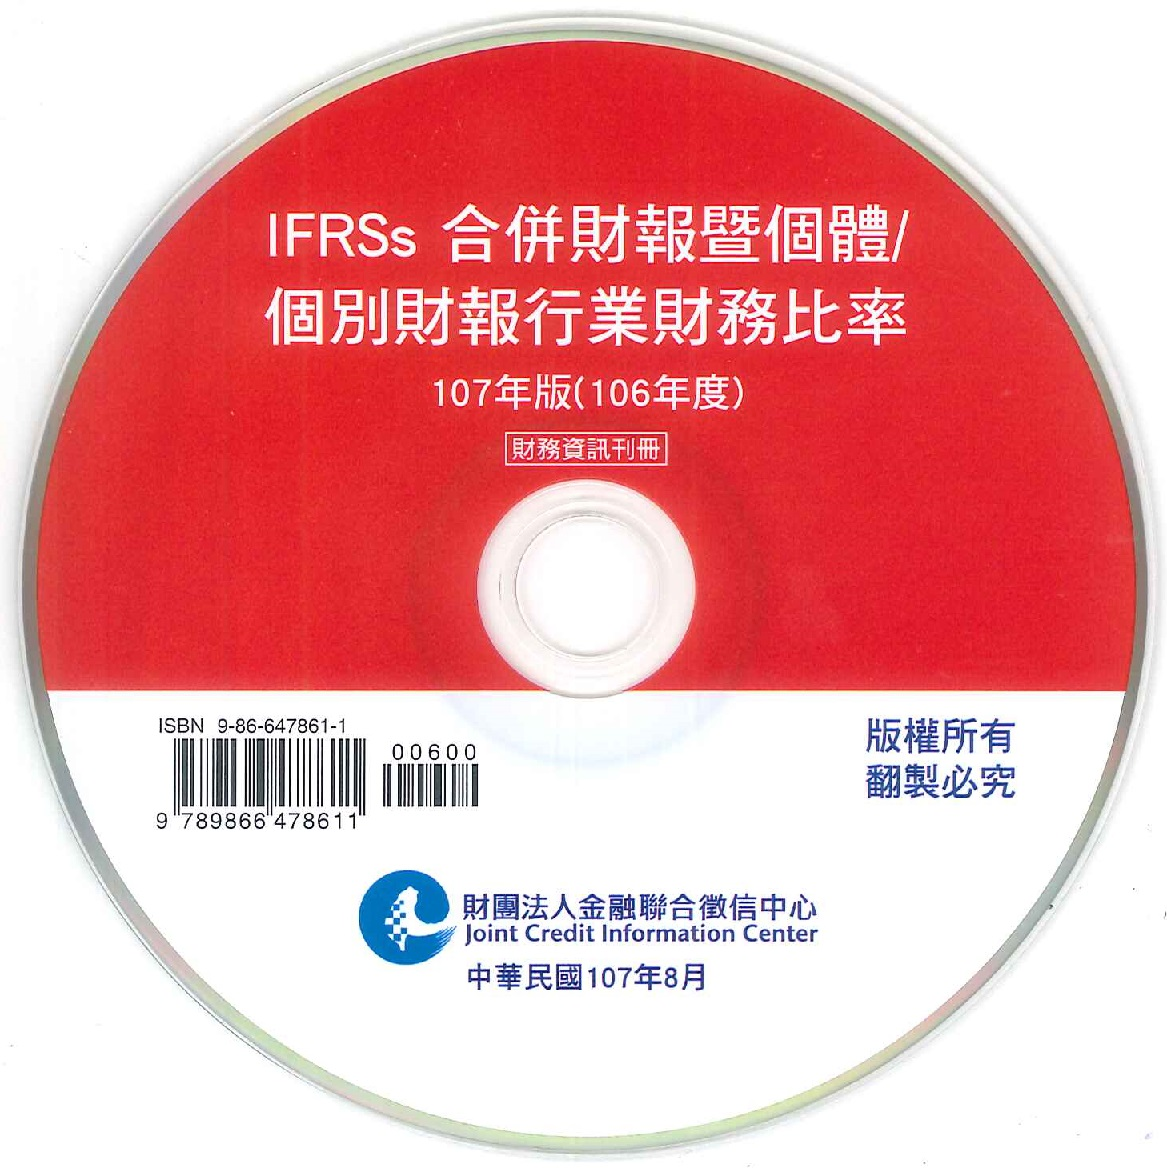 IFRSs合併財報暨個體/個別財報行業財務比率 [電子書]